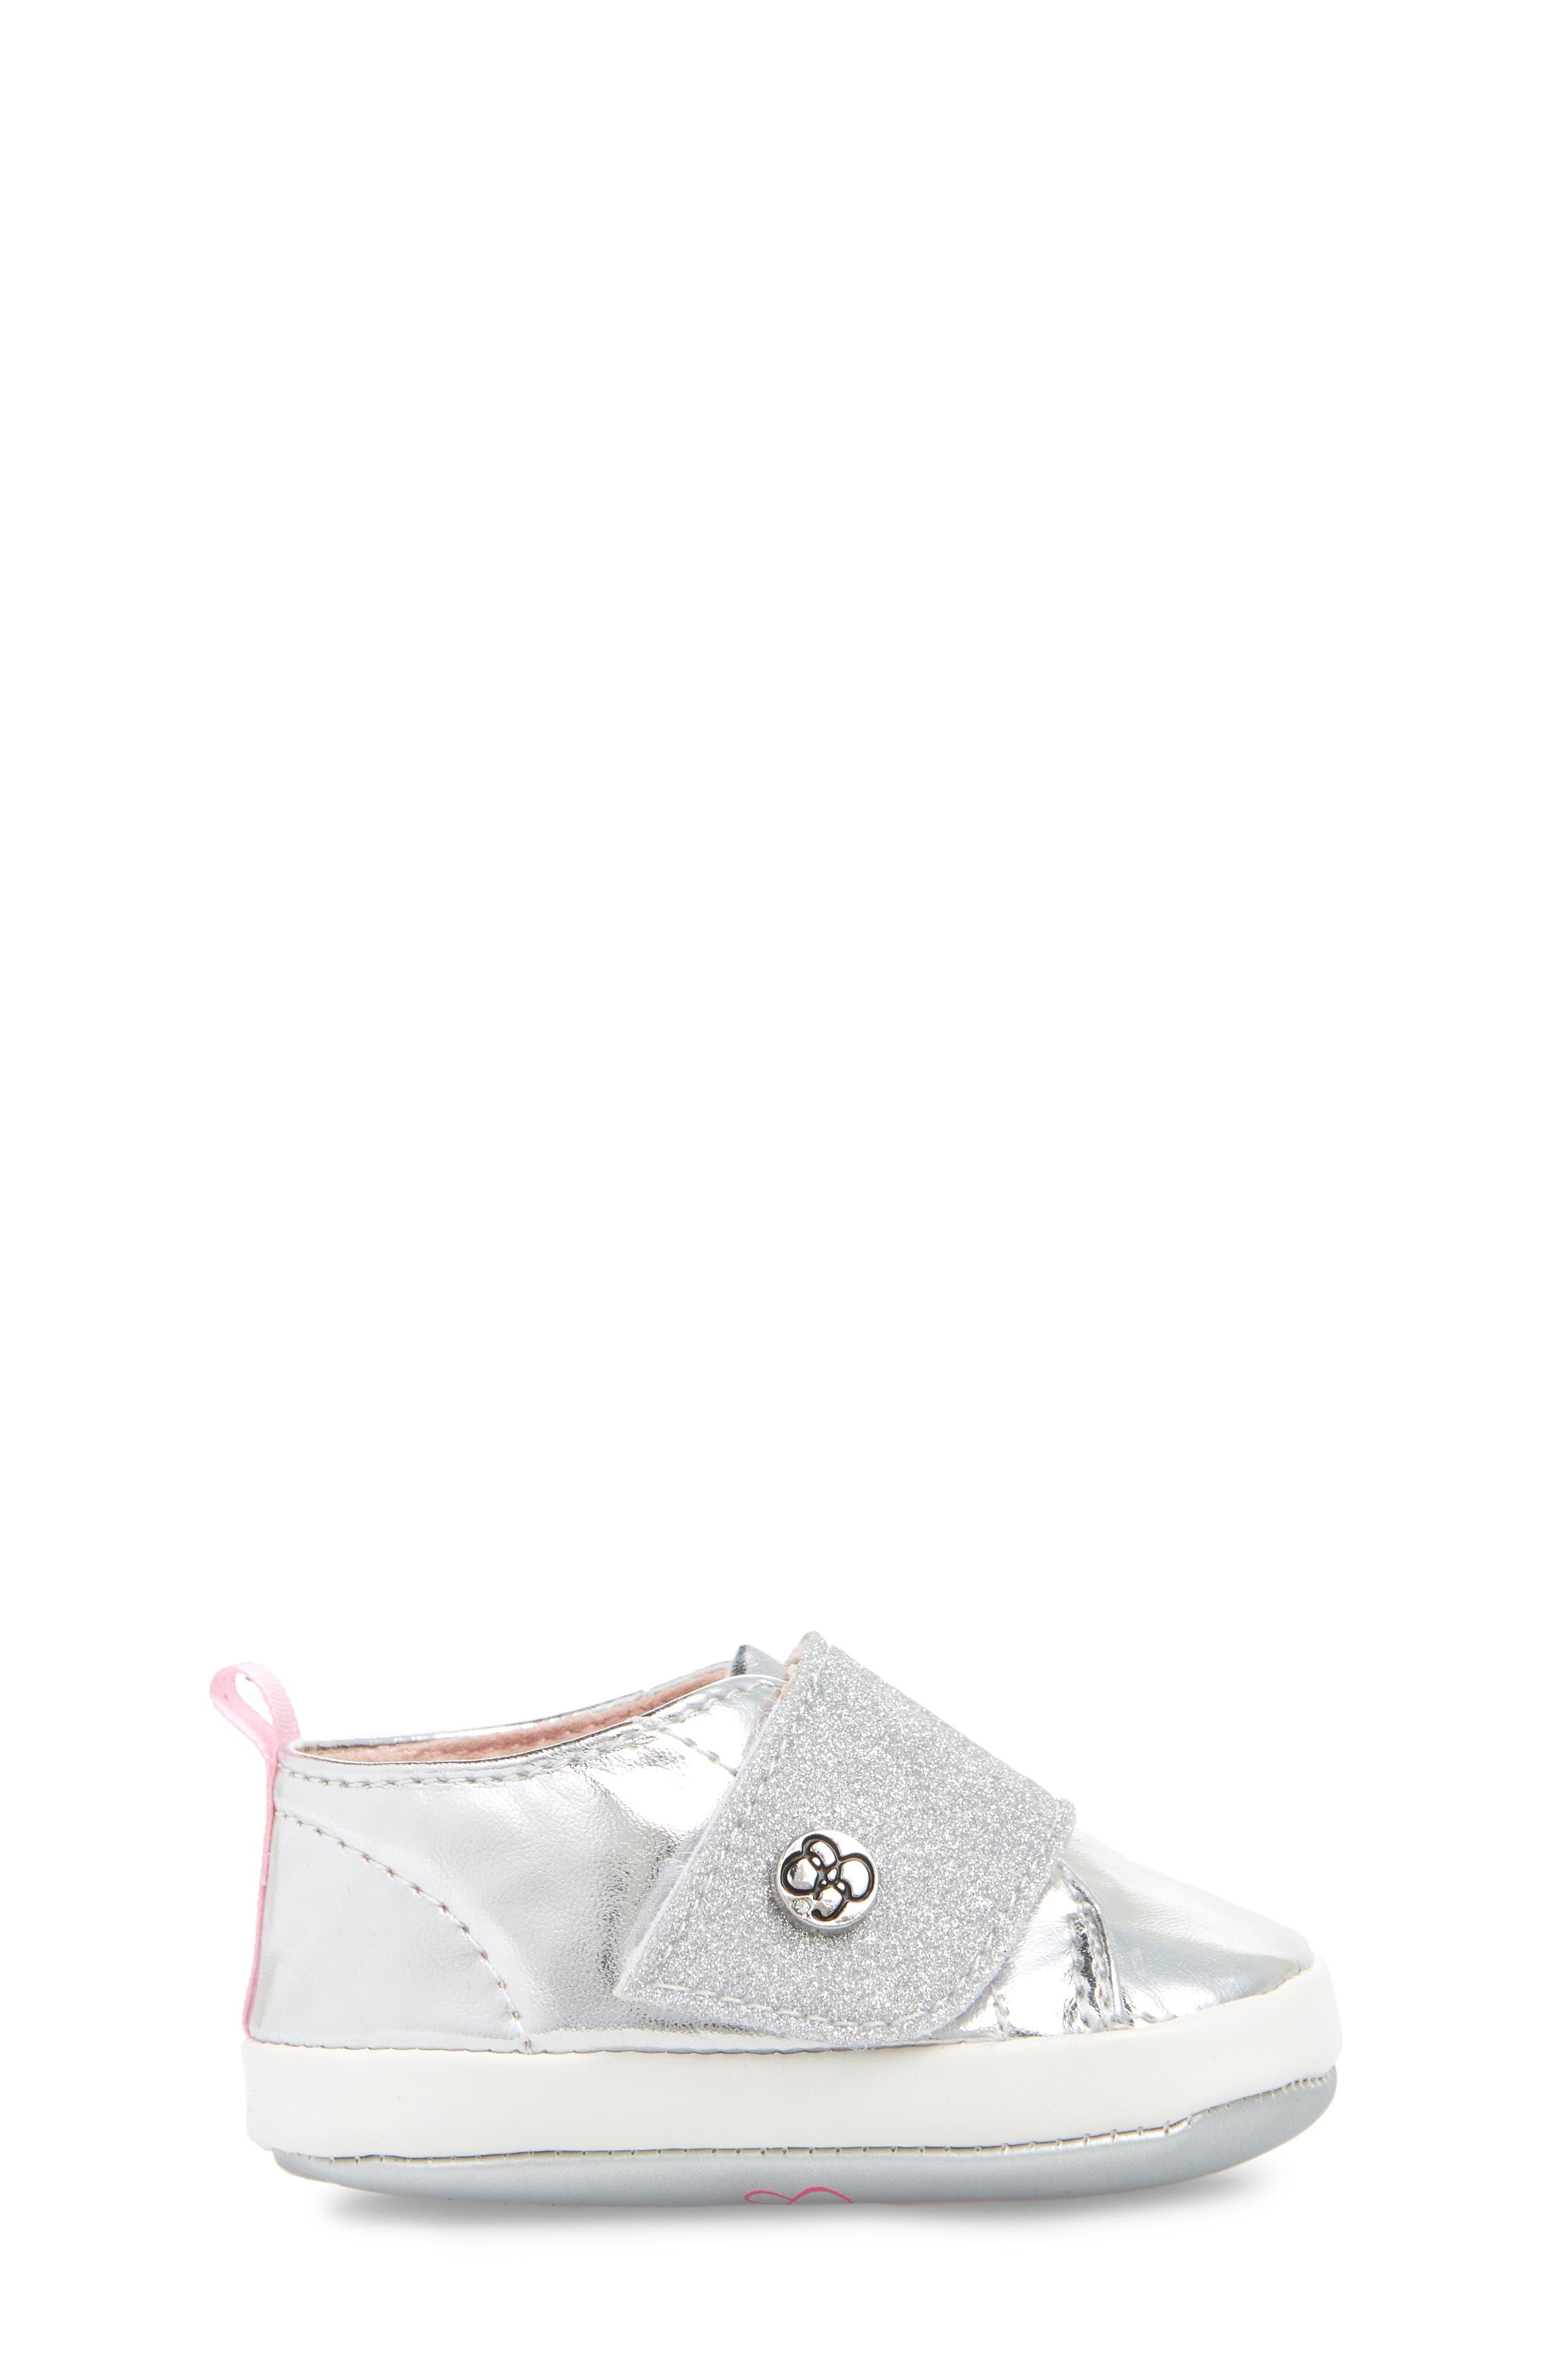 JESSICA SIMPSON,                             Glitter Crib Sneaker,                             Alternate thumbnail 3, color,                             040